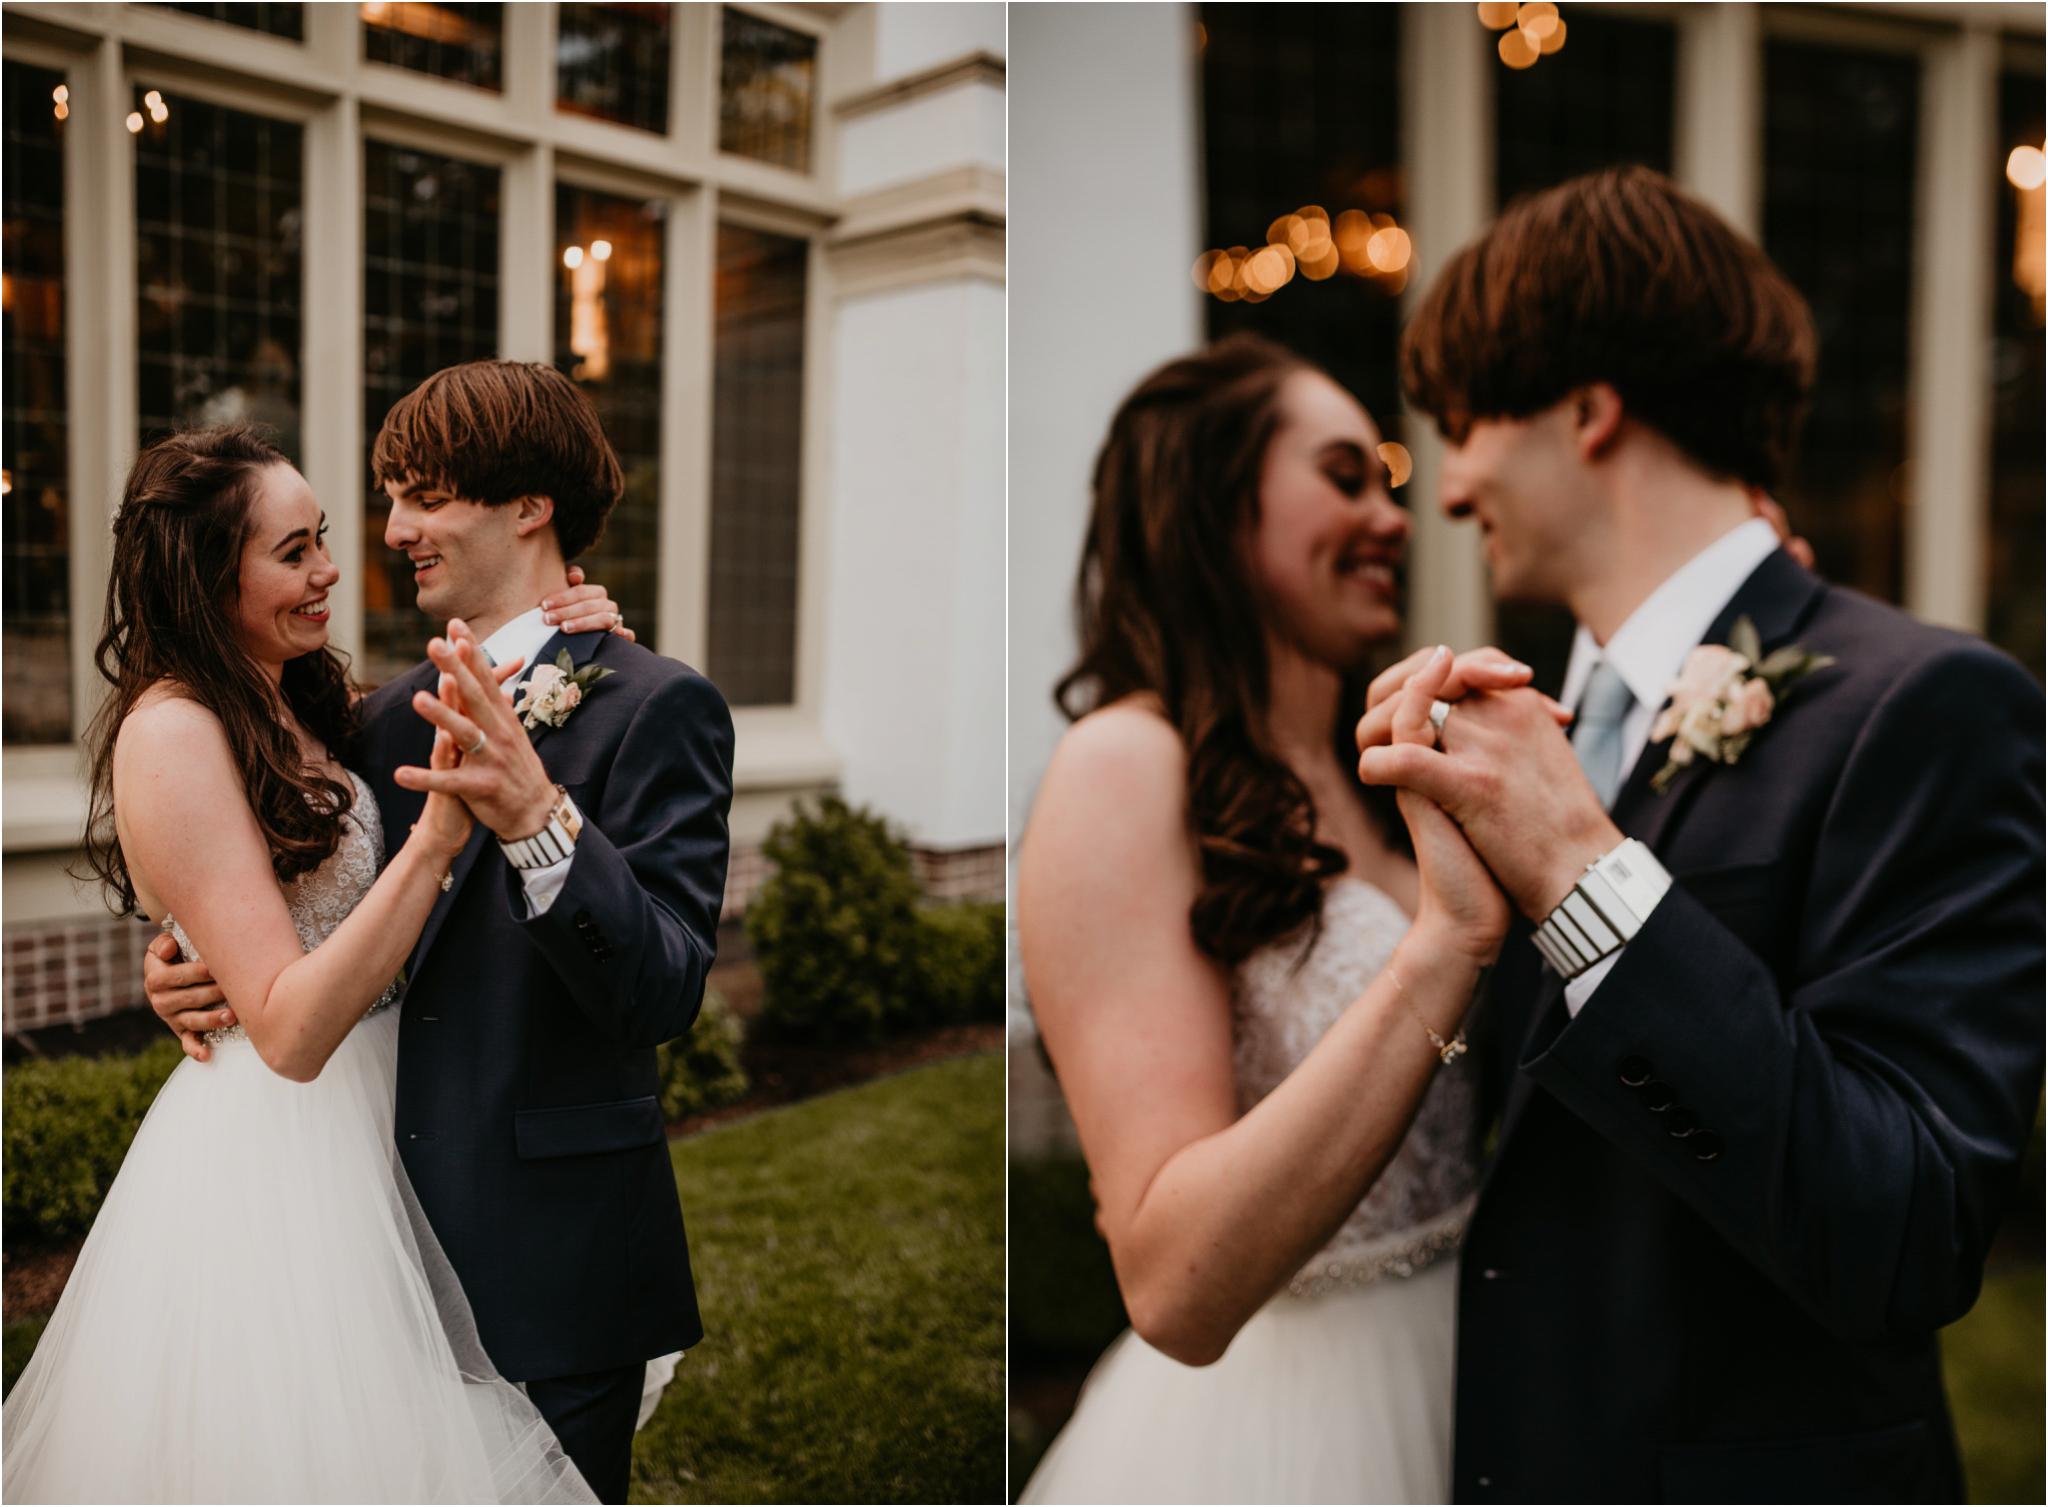 chance-and-ondrea-lairmont-manor-wedding-seattle-photographer-124.jpg